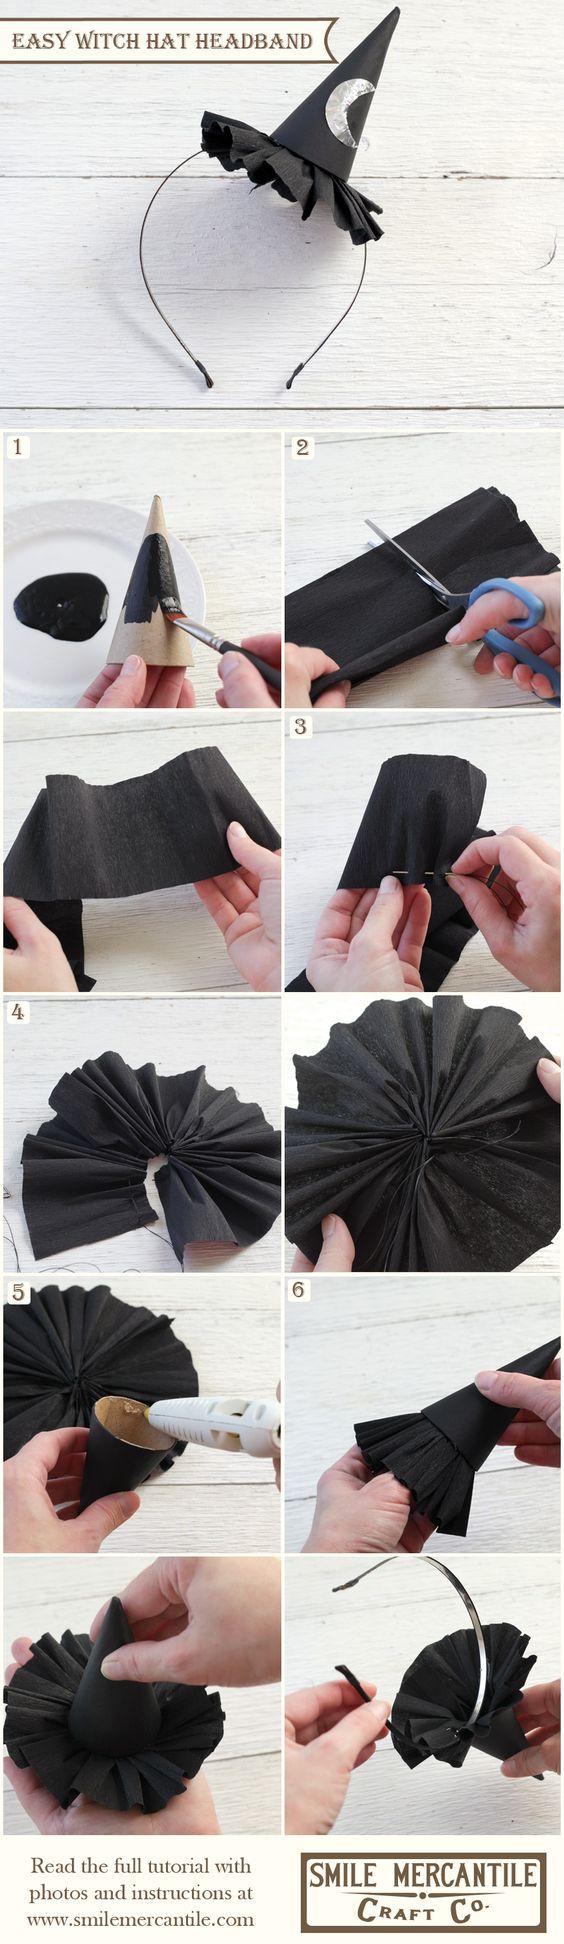 Easy Witch Hat Headband.